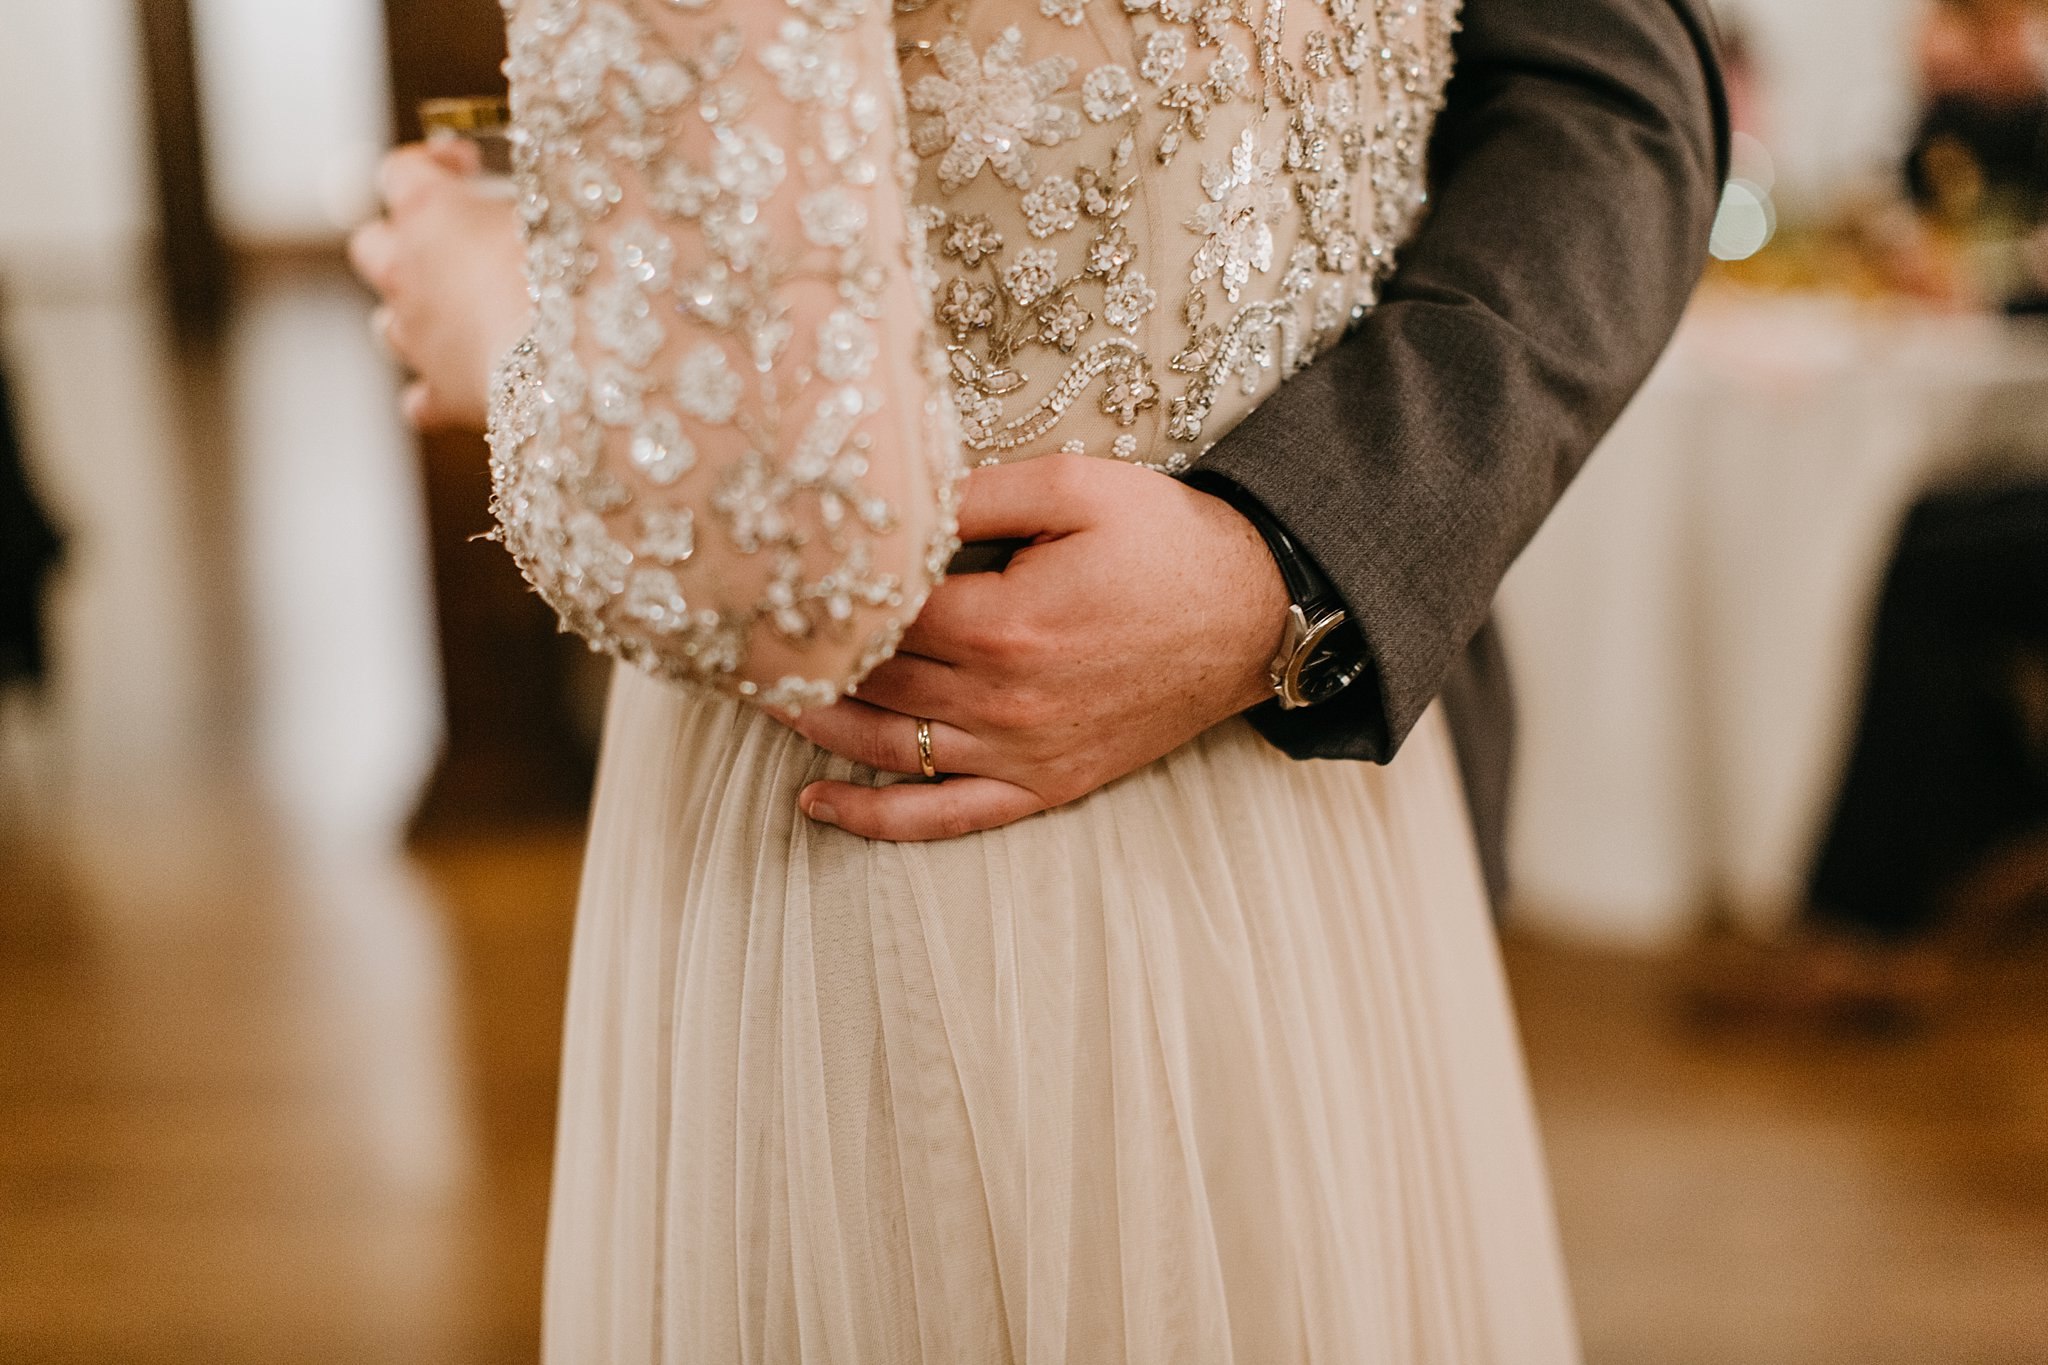 Wilderlove Co_Waco Texas_The Phoenix_Romantic Wedding Photography_0089.jpg